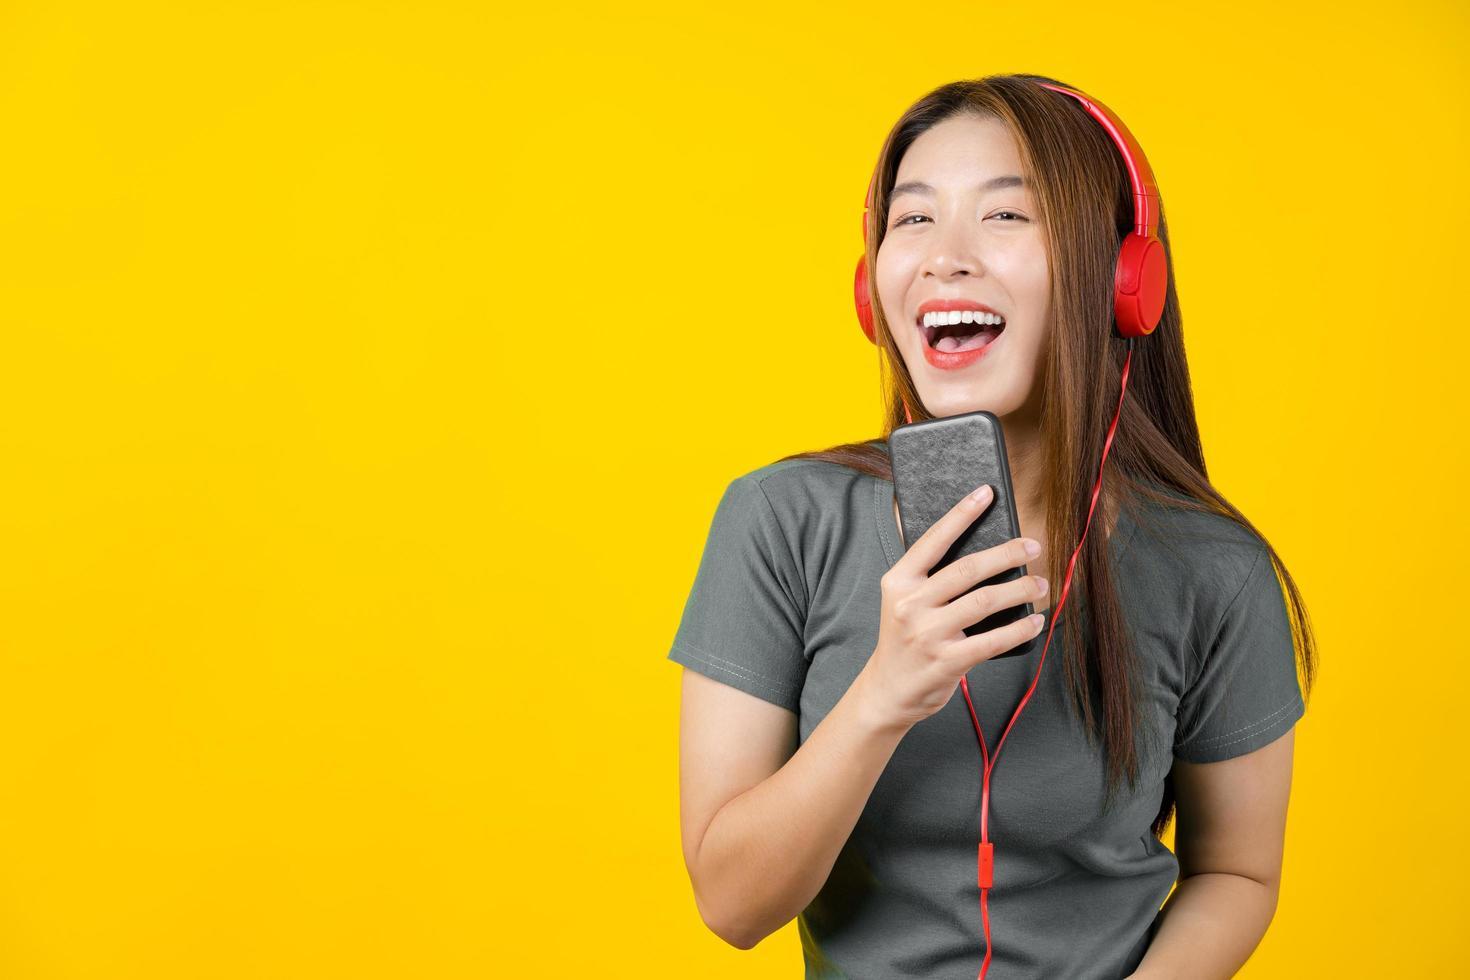 ung asiatisk kvinna lyssnar på musik foto